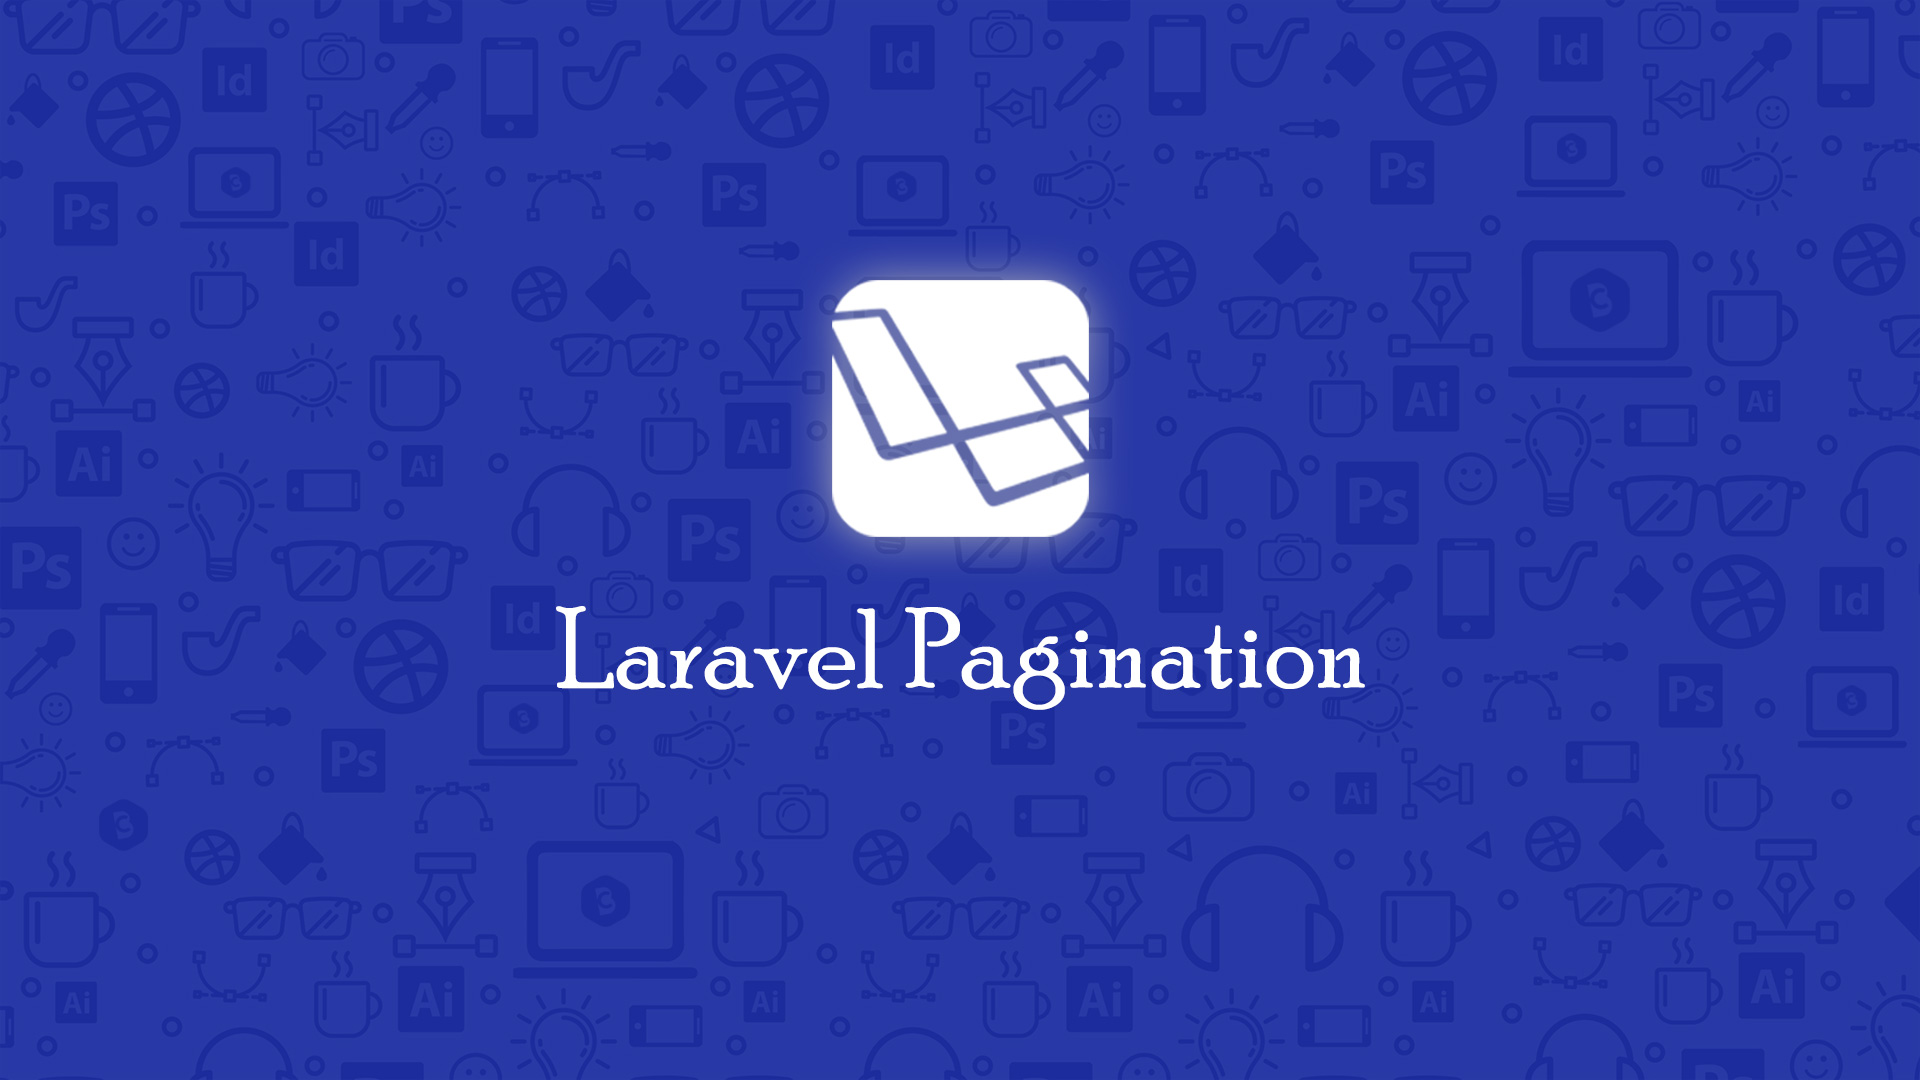 Handling Laravel Pagination - Code Briefly